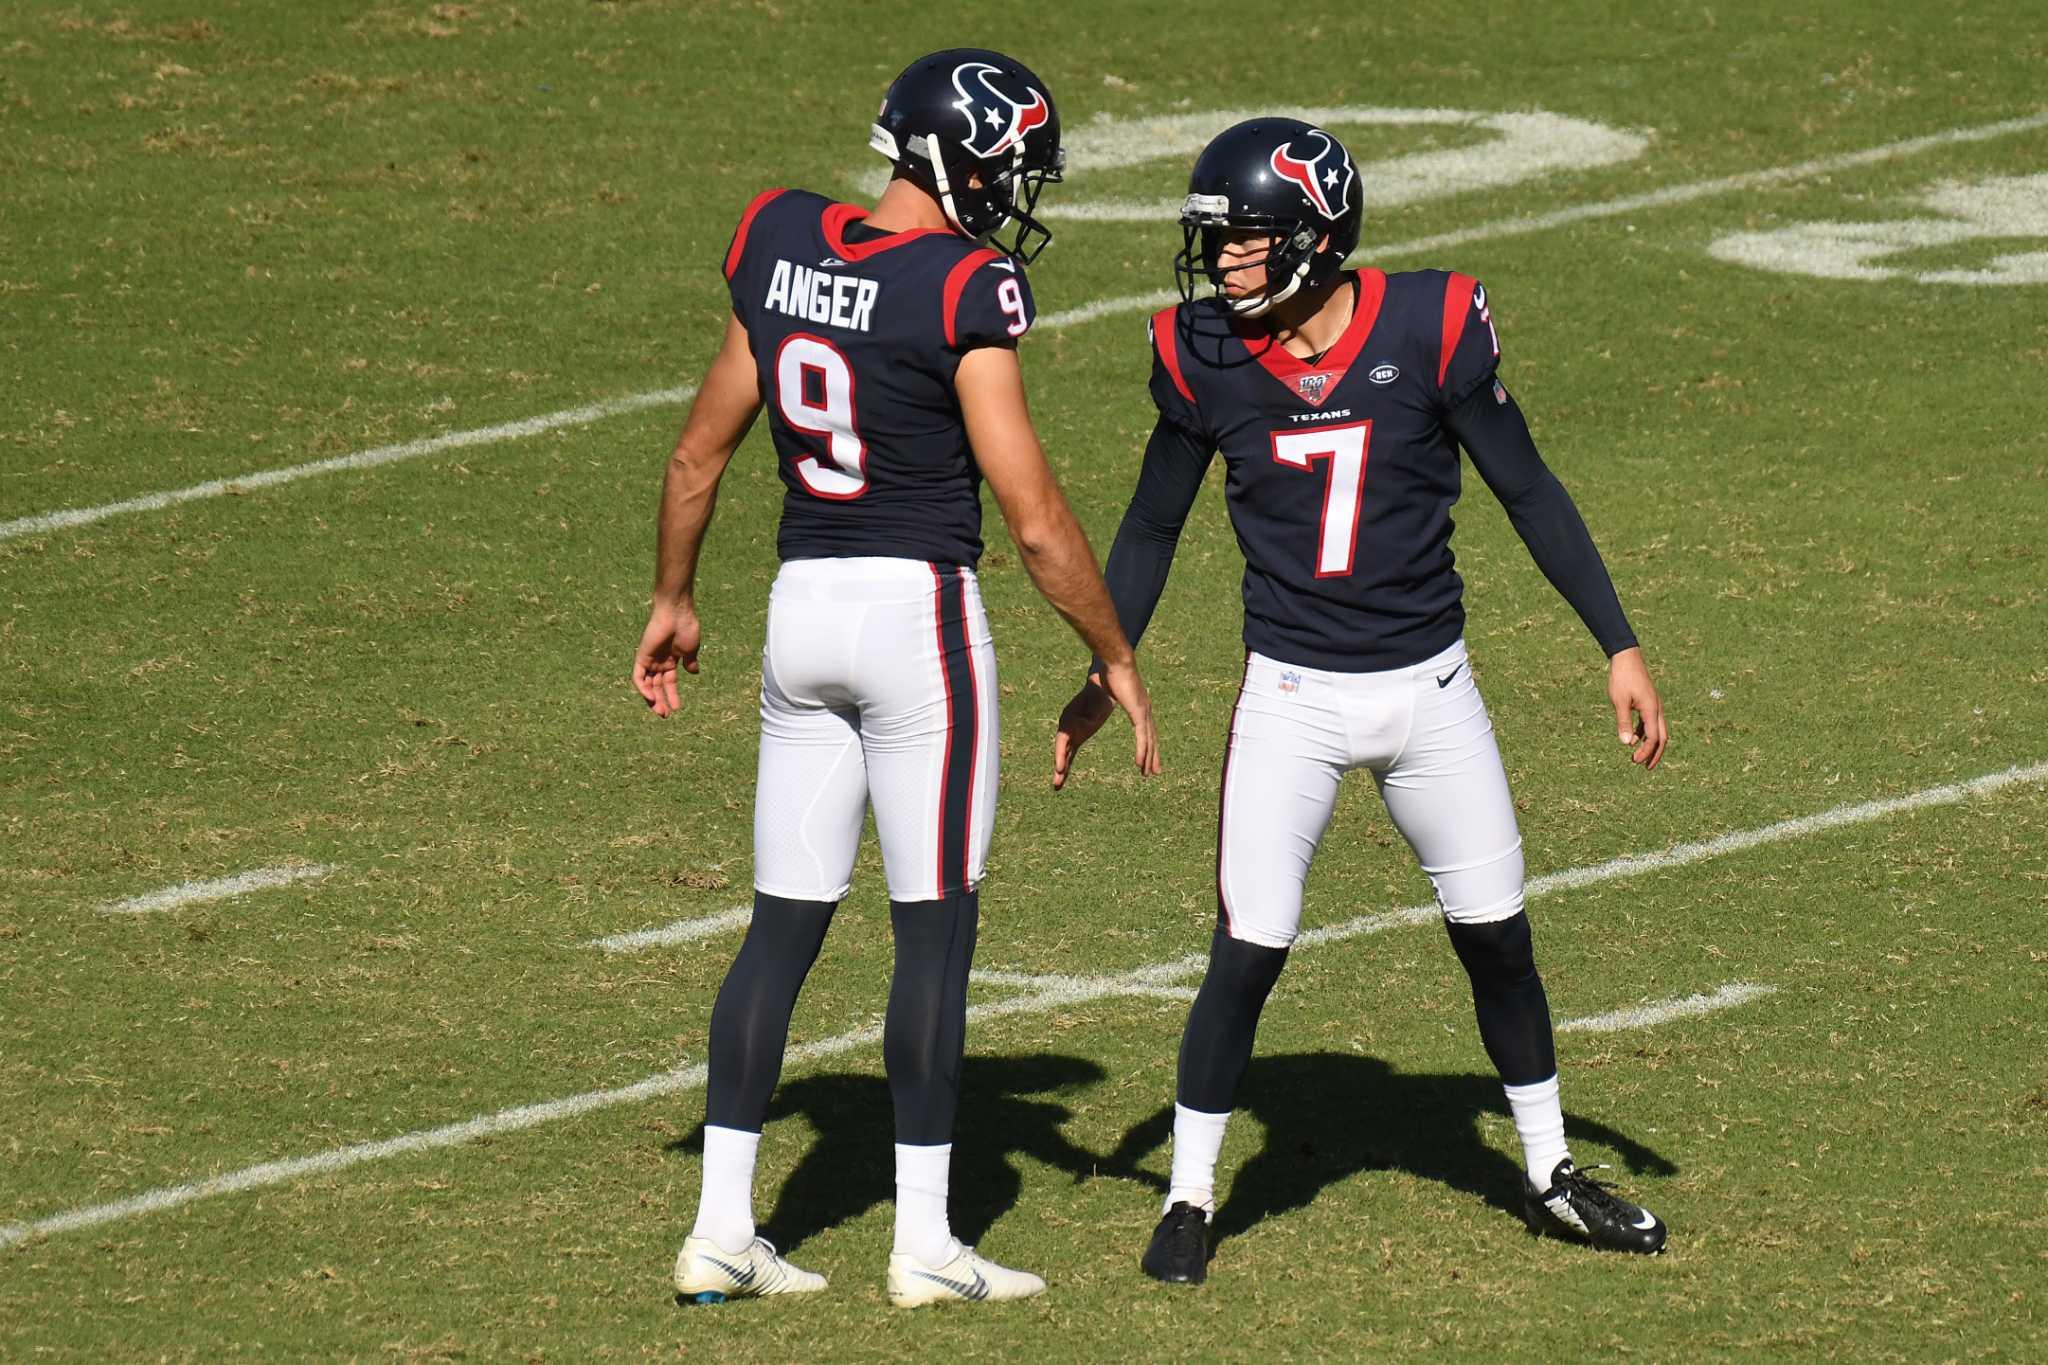 Texans kicker Ka'imi Fairbairn working to make corrections